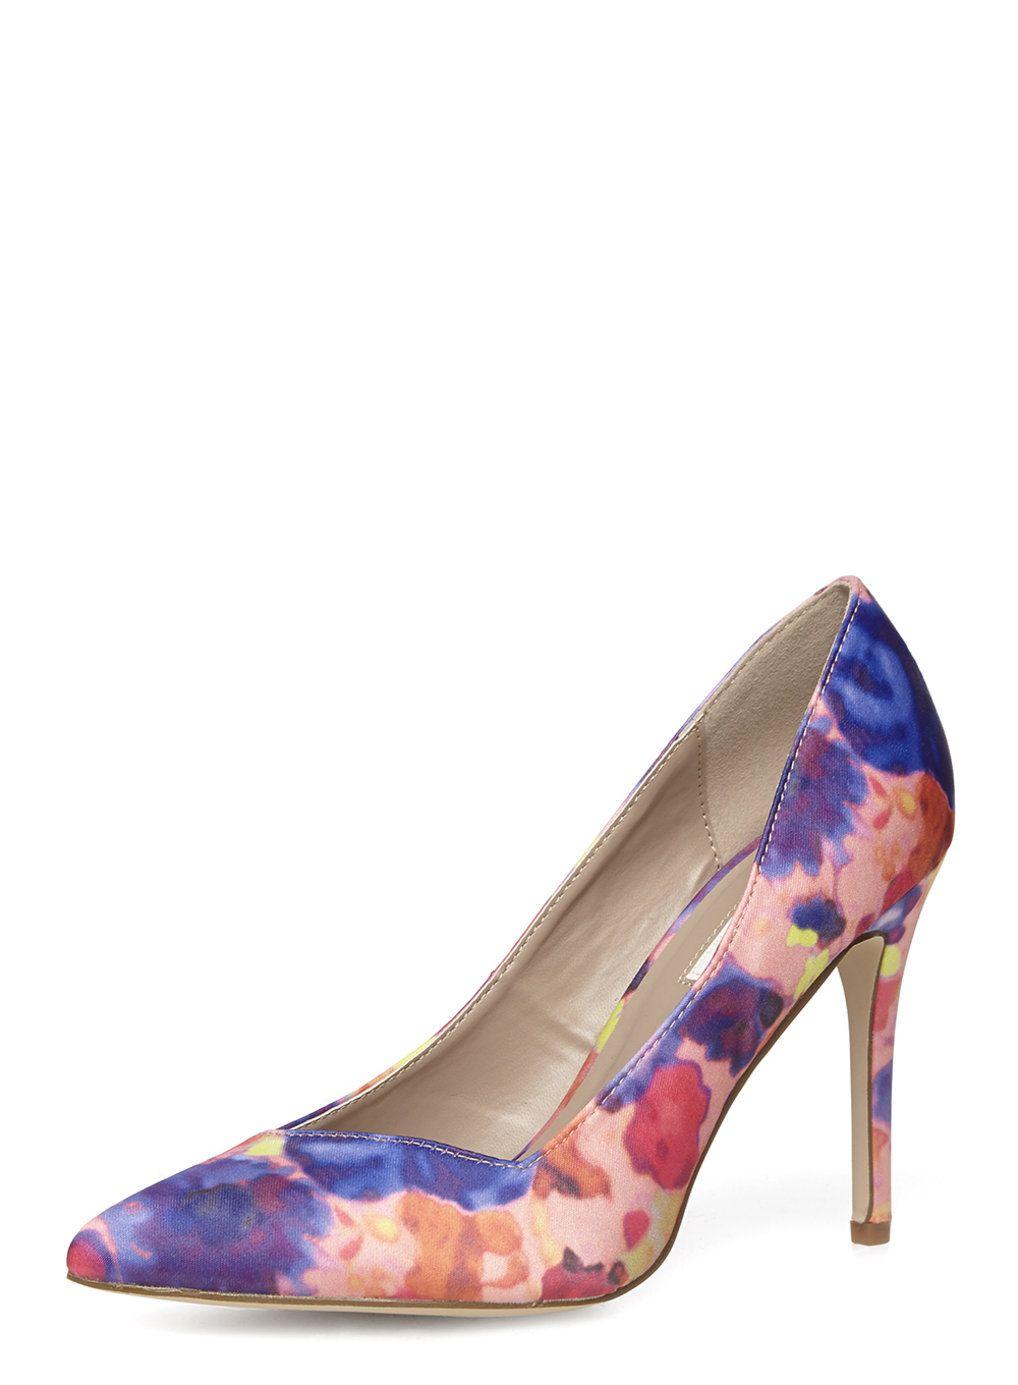 71a3d9eb3de Wide fit pink high point court shoes - Dorothy Perkins | Sophie's ...